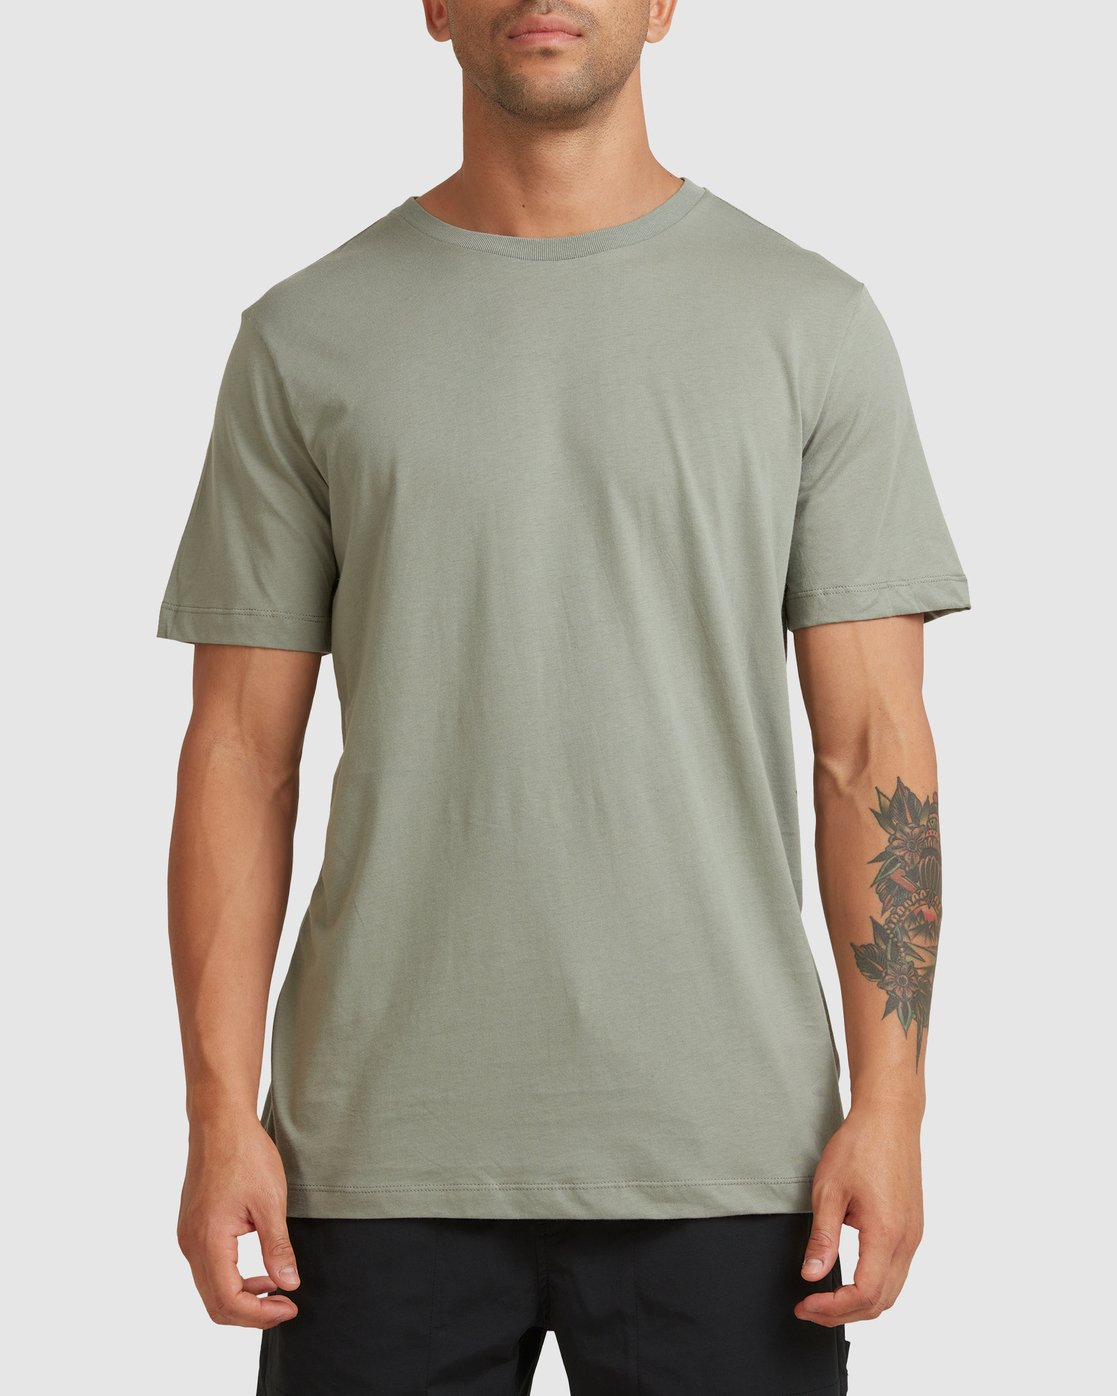 0 RVCA BASIC TEE Green R117067 RVCA